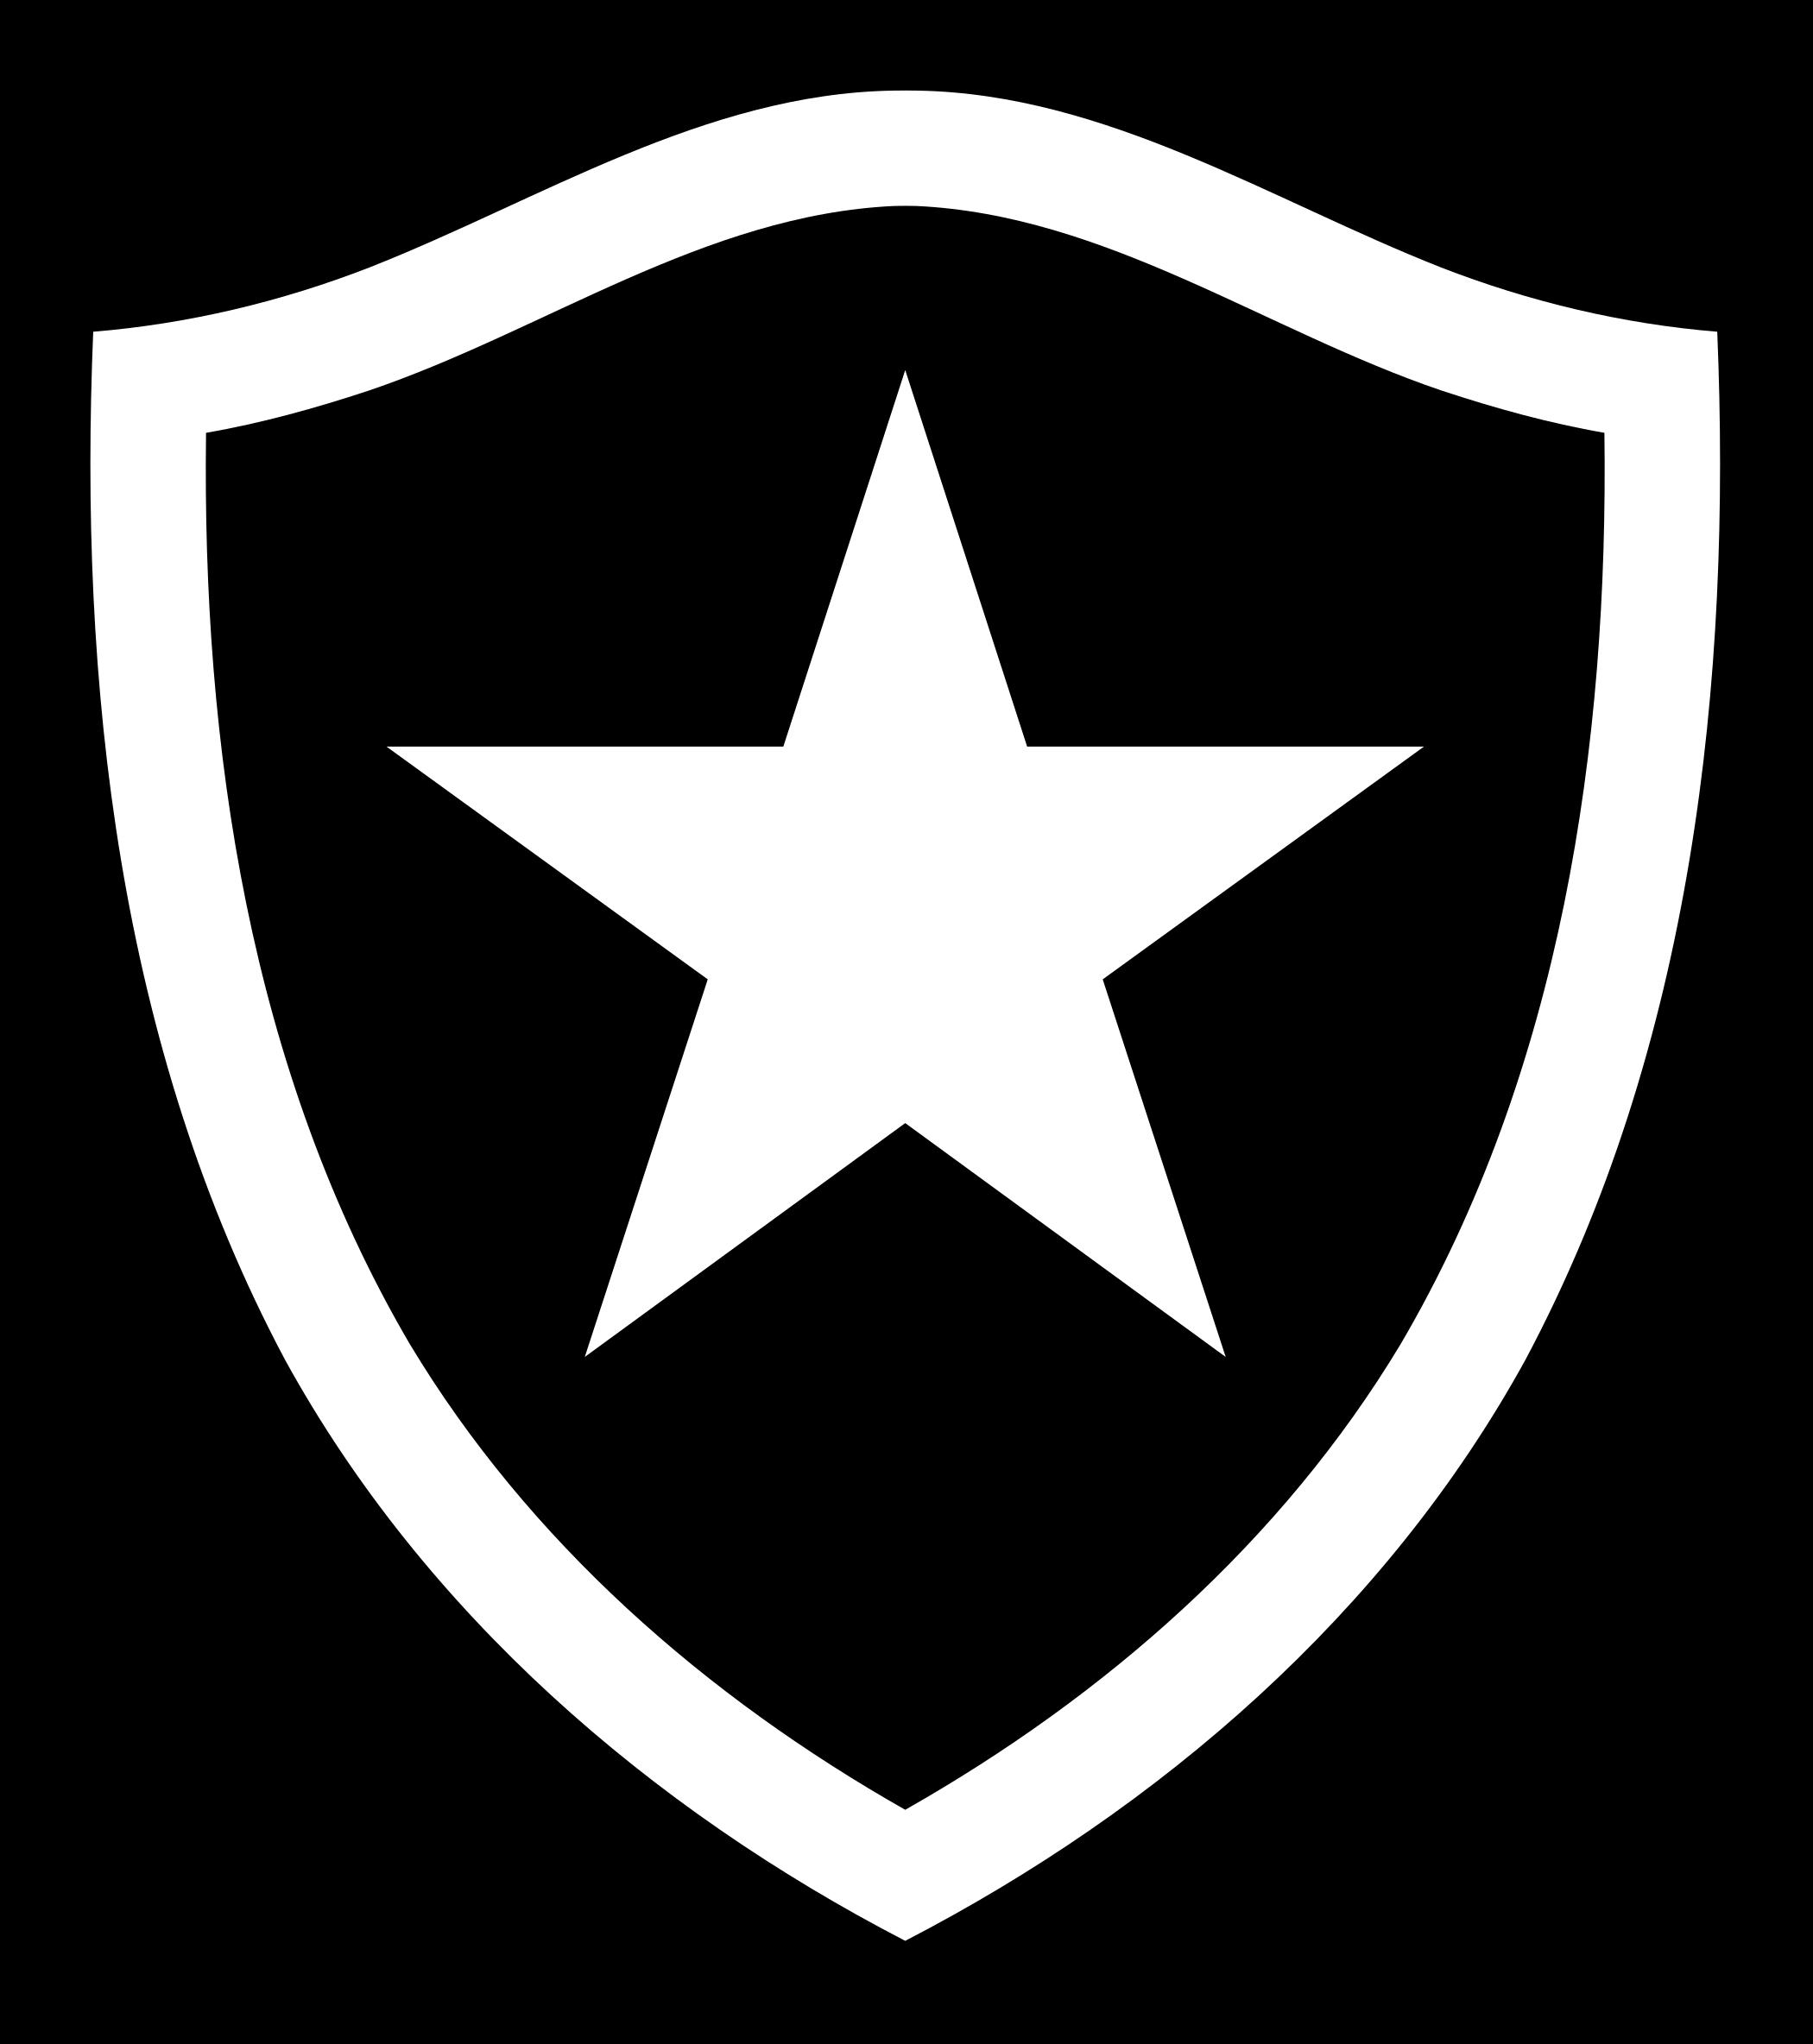 botafogo logo escudo 1 - Botafogo Logo - Escudo